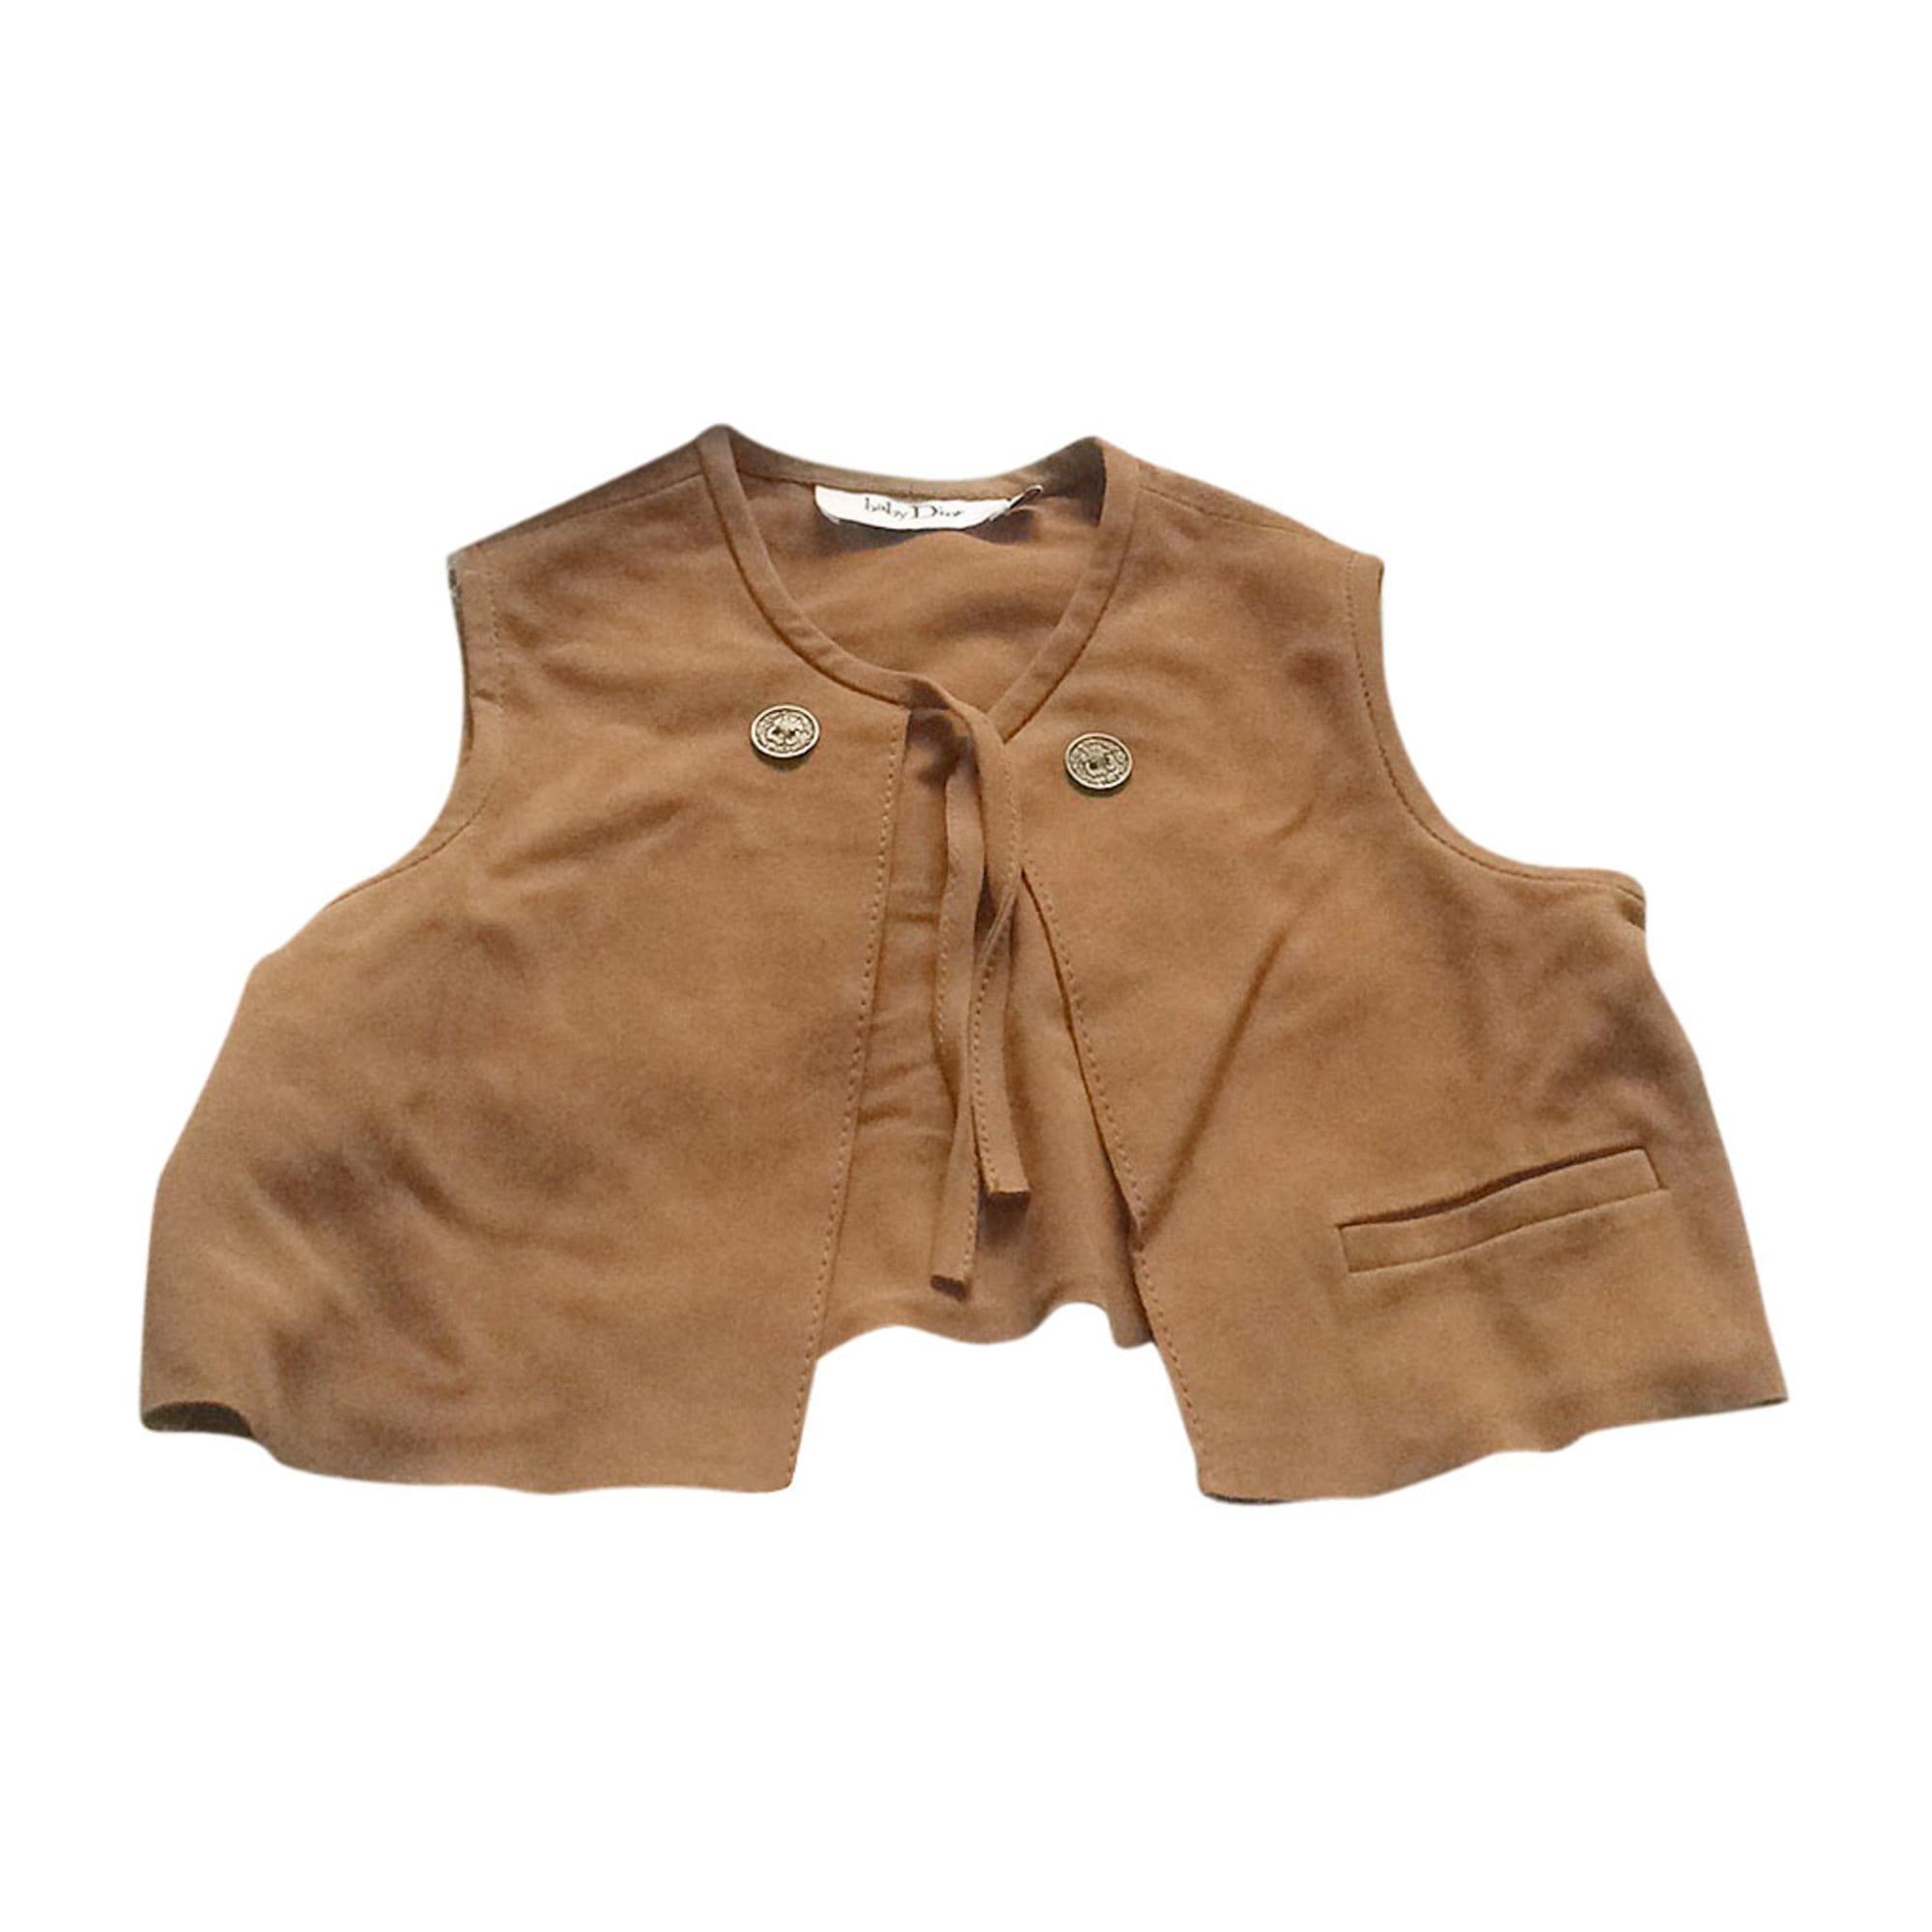 Jacket BABY DIOR Beige, camel